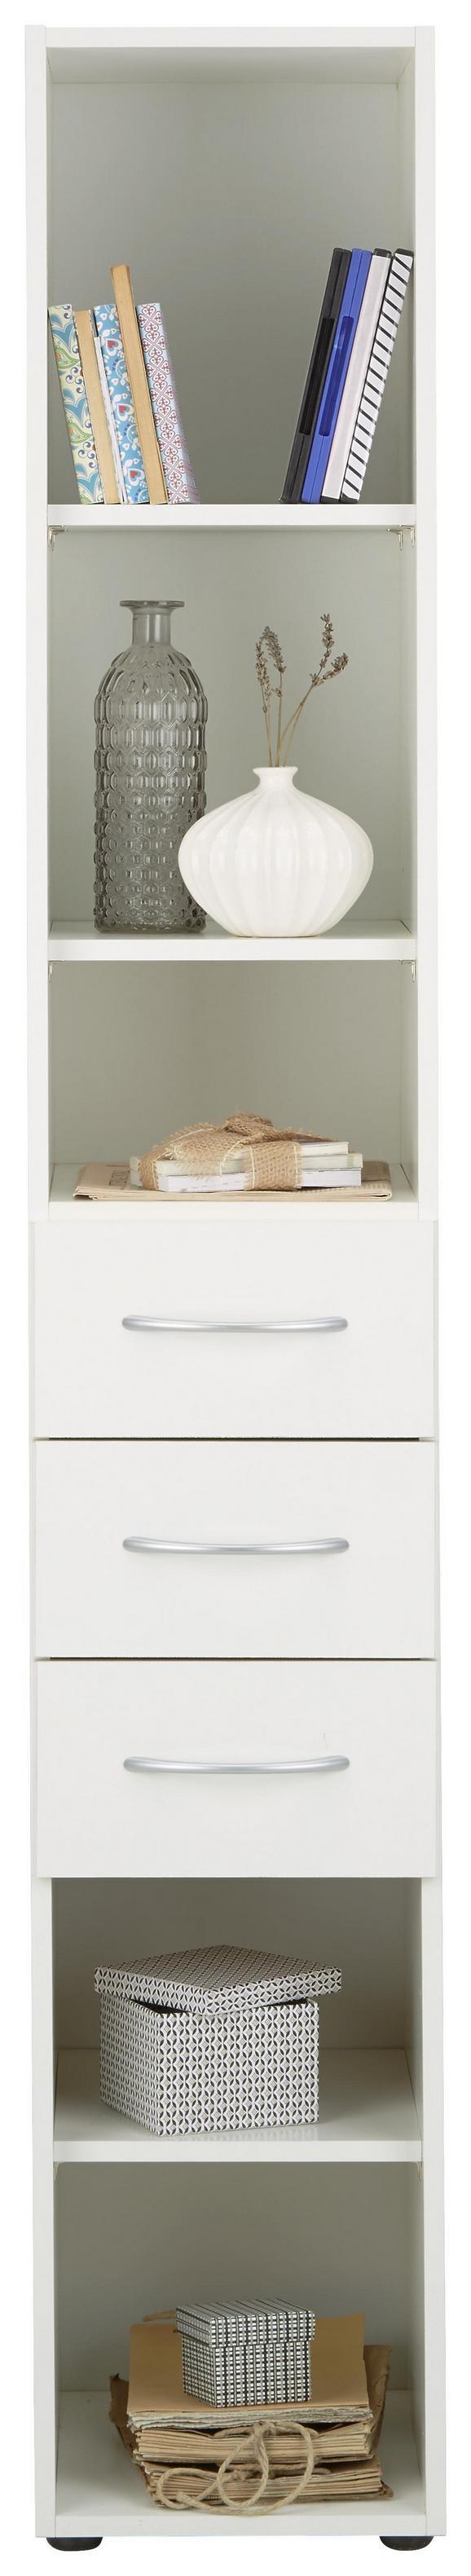 Večnamenska Omara Mrk - aluminij/bela, umetna masa/leseni material (30/185/40cm) - Mömax modern living